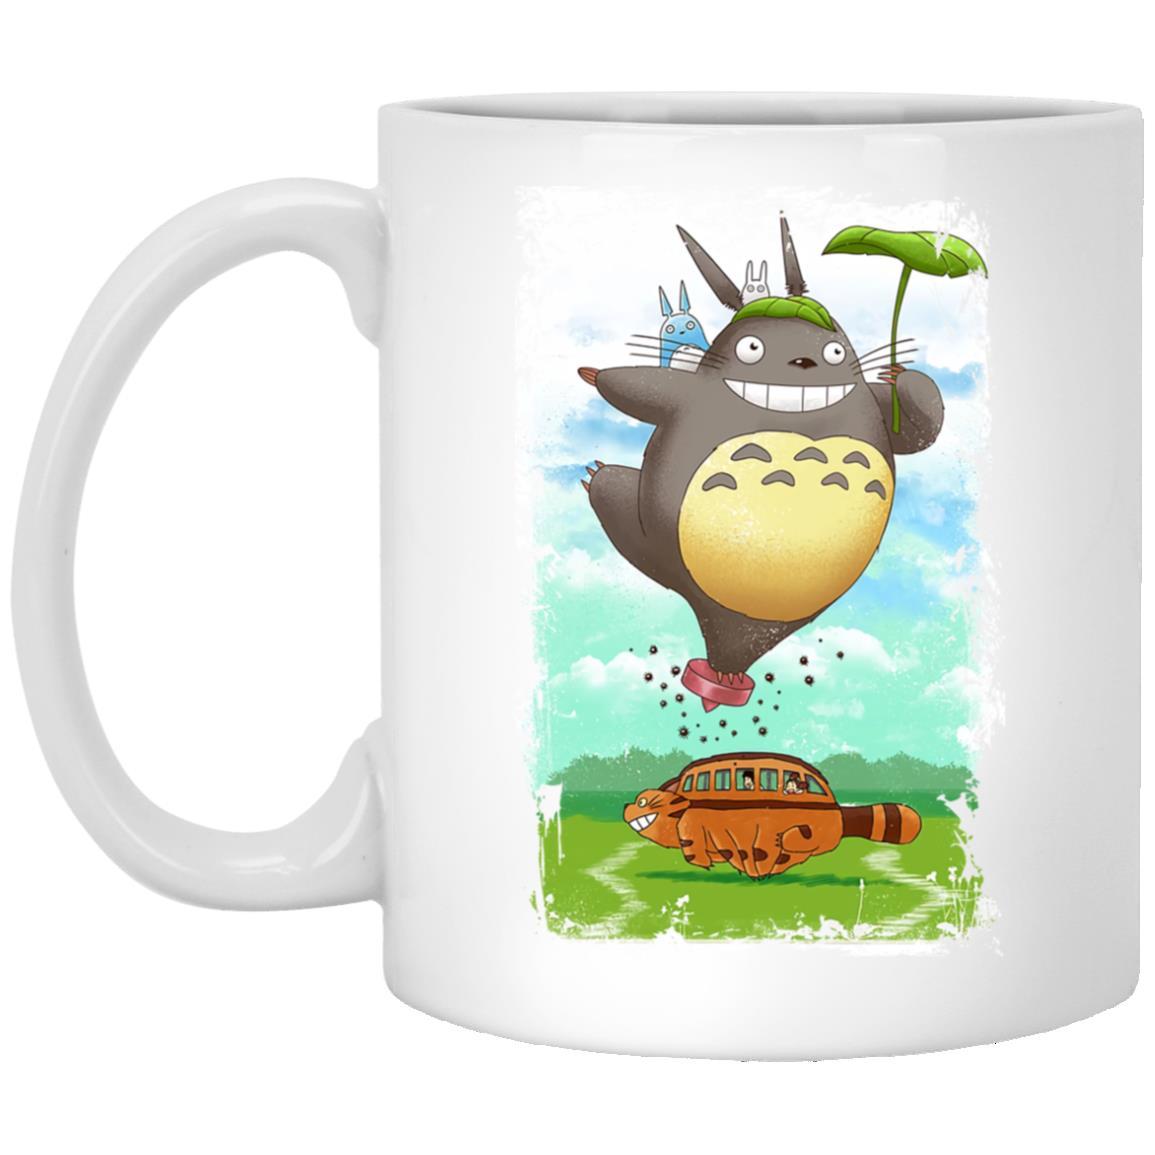 Totoro the Funny Neighbor Mug